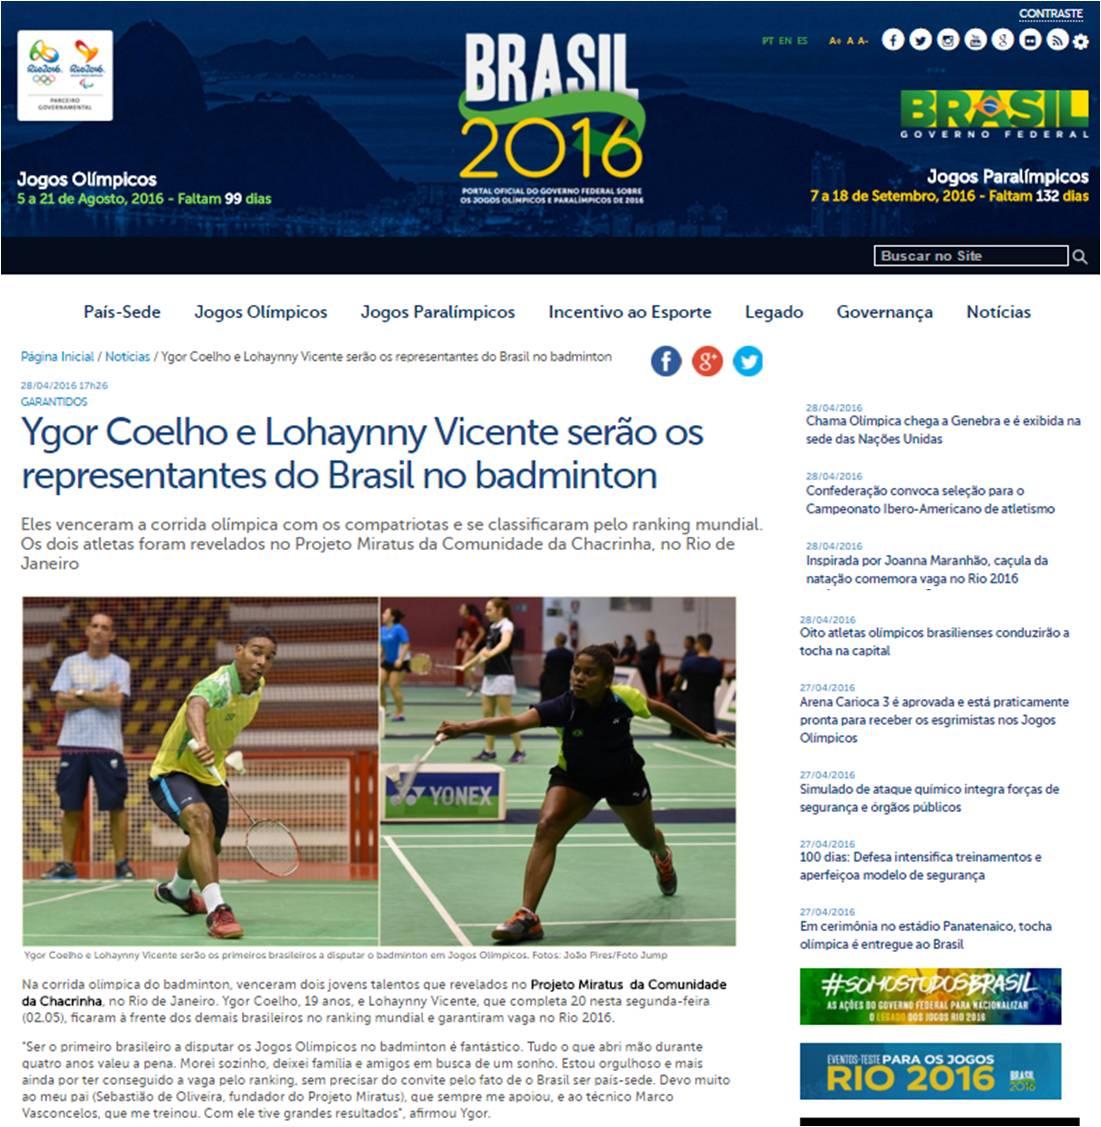 2016 04 28 Ministerio Esporte